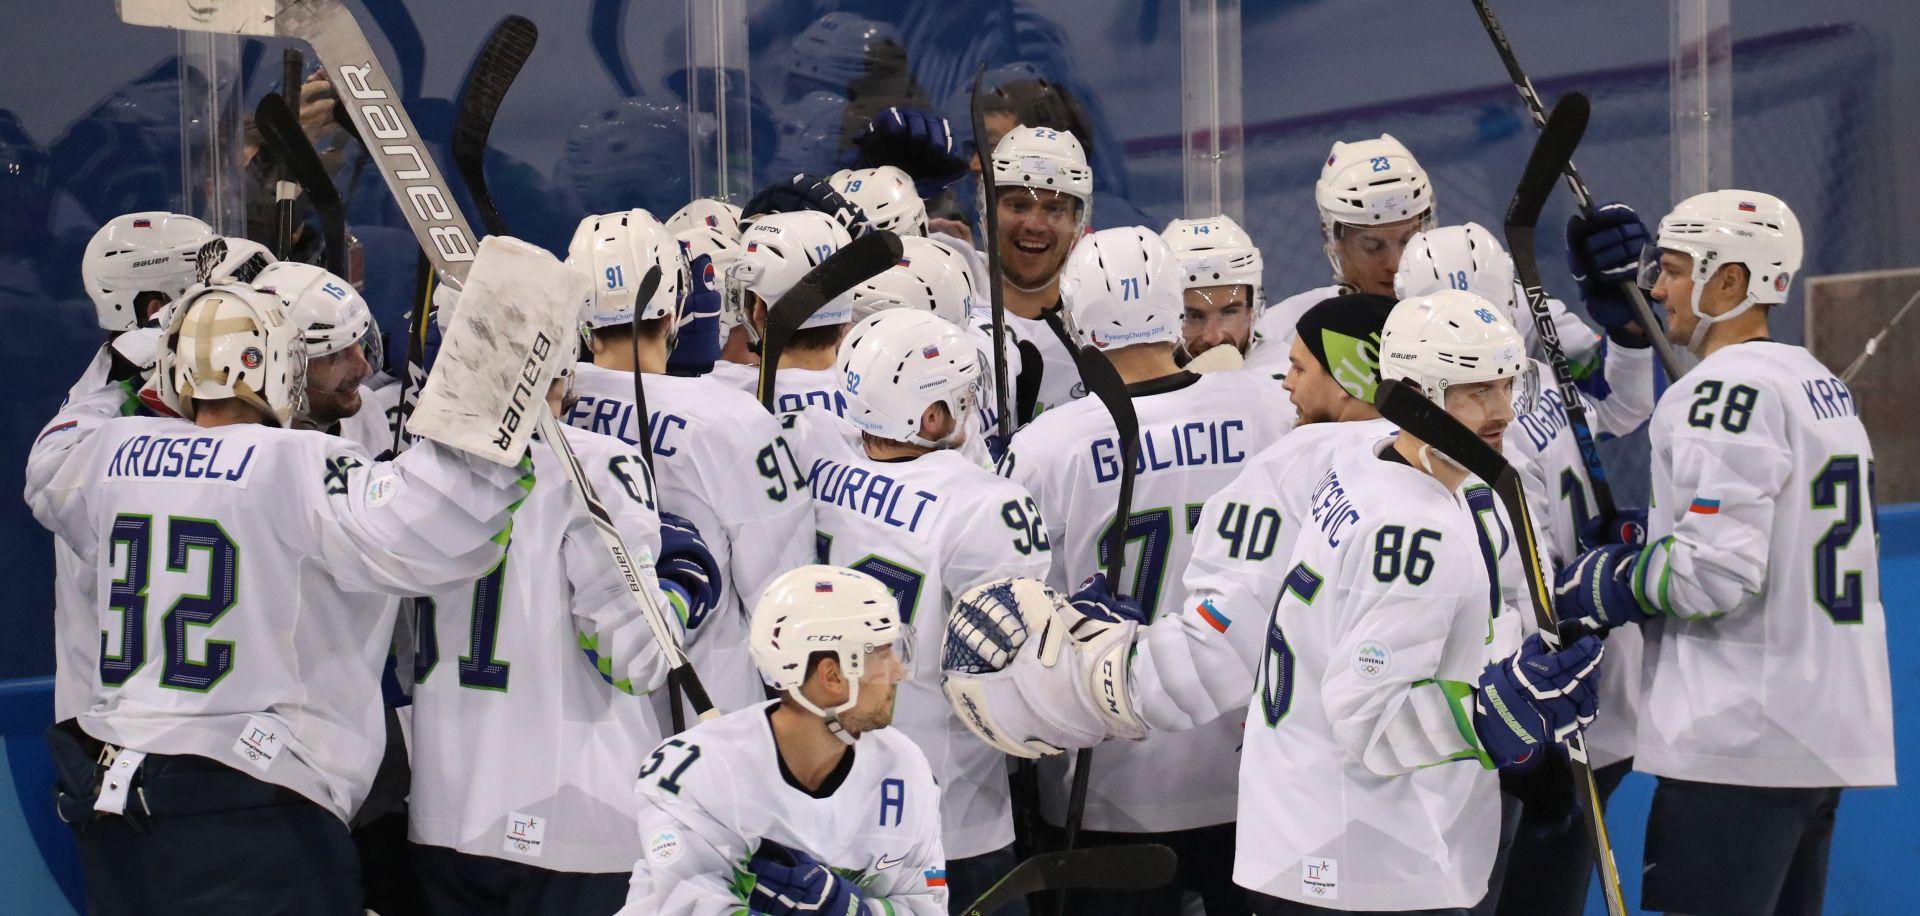 ZOI Slovenski hokejaš Jeglič pozitivan na doping kontroli